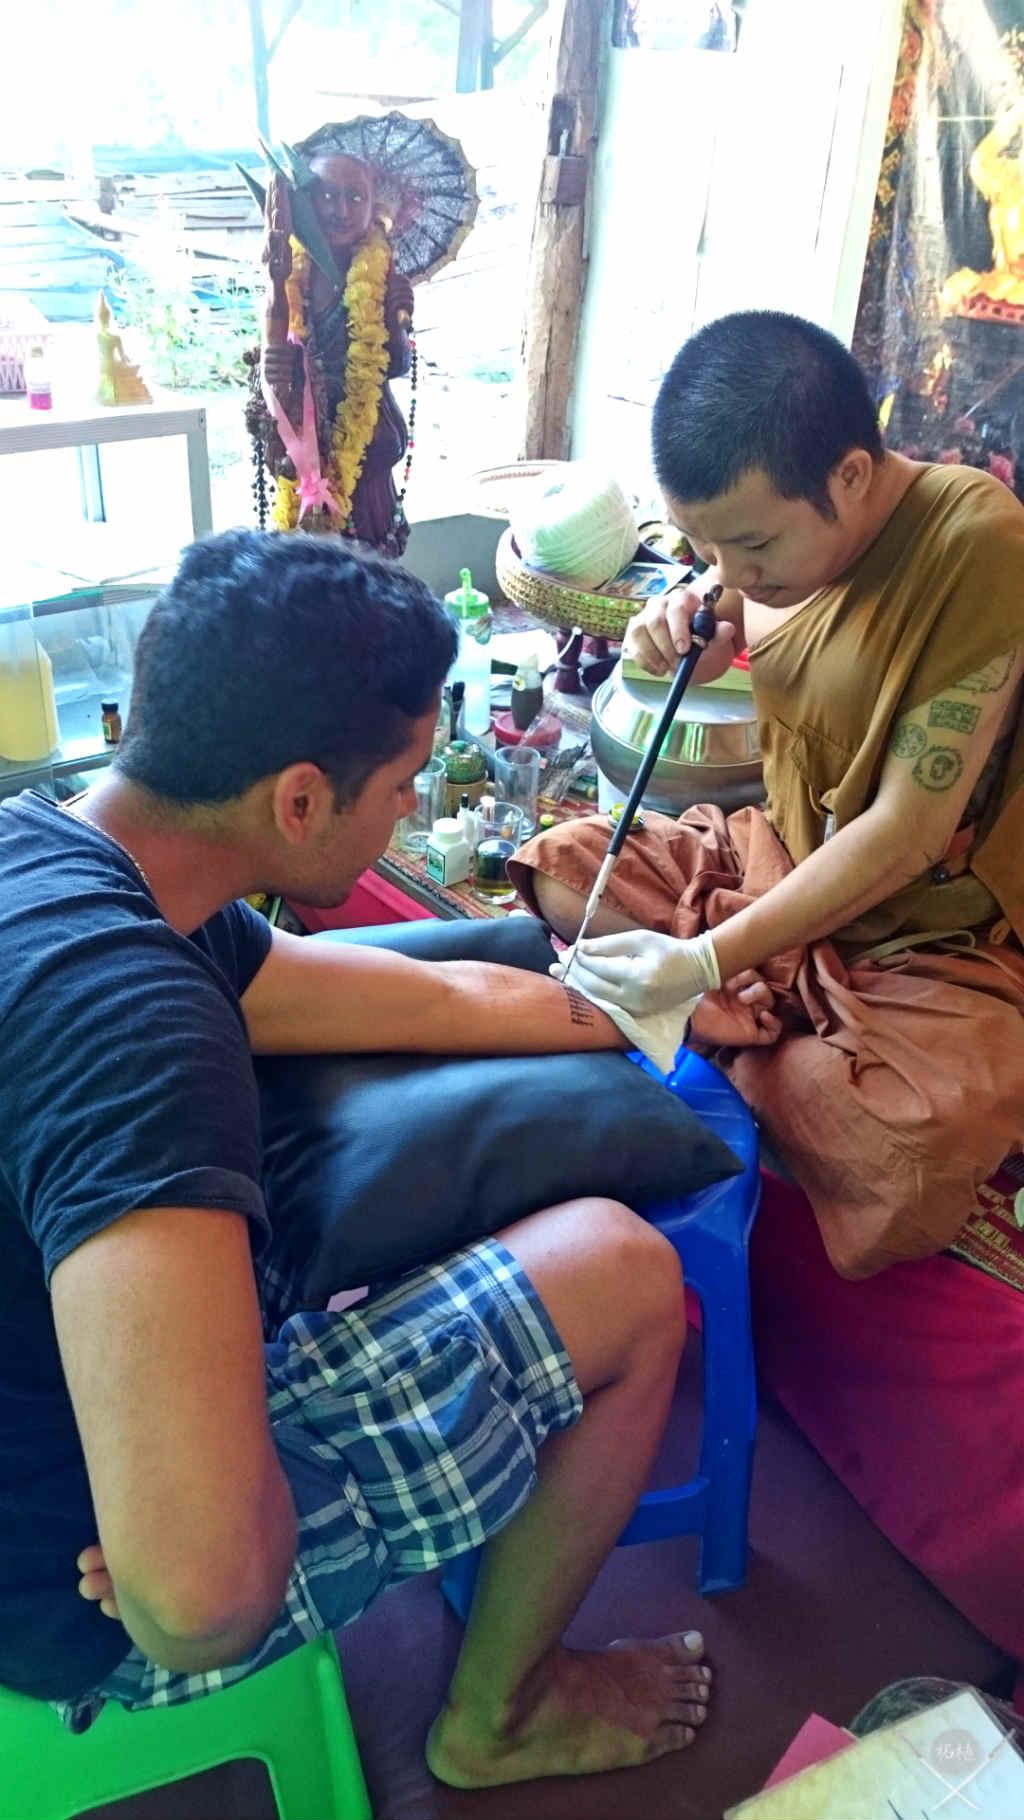 Thailand - Chiang Mai - Tattoo 2 - Viagens - Vida de Tsuge - VDT